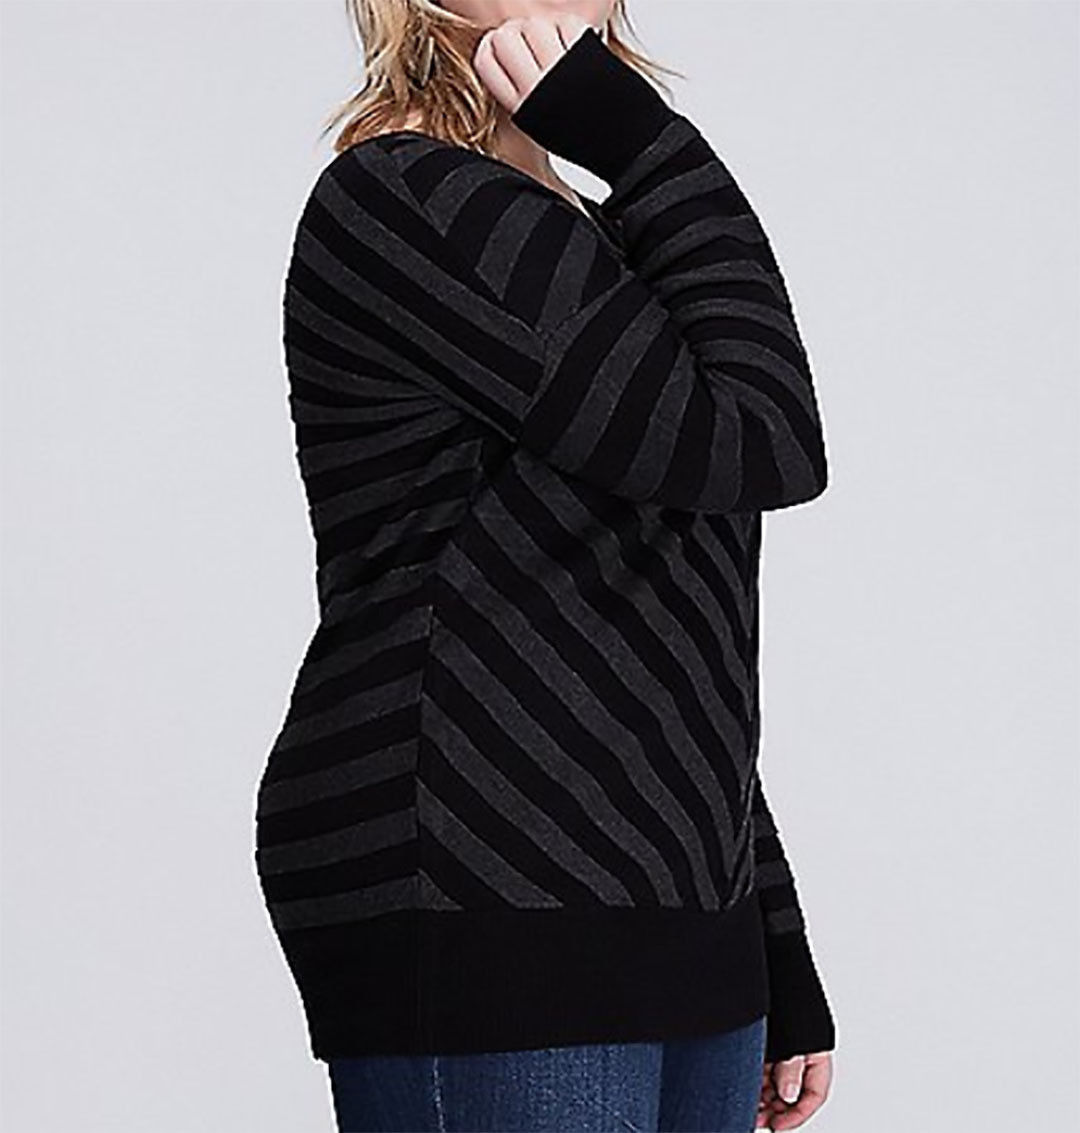 ba98cd8e094 Lane Bryant Womens Sweater 14 16 Double V-Neck Chevron Striped Black  Mitered New